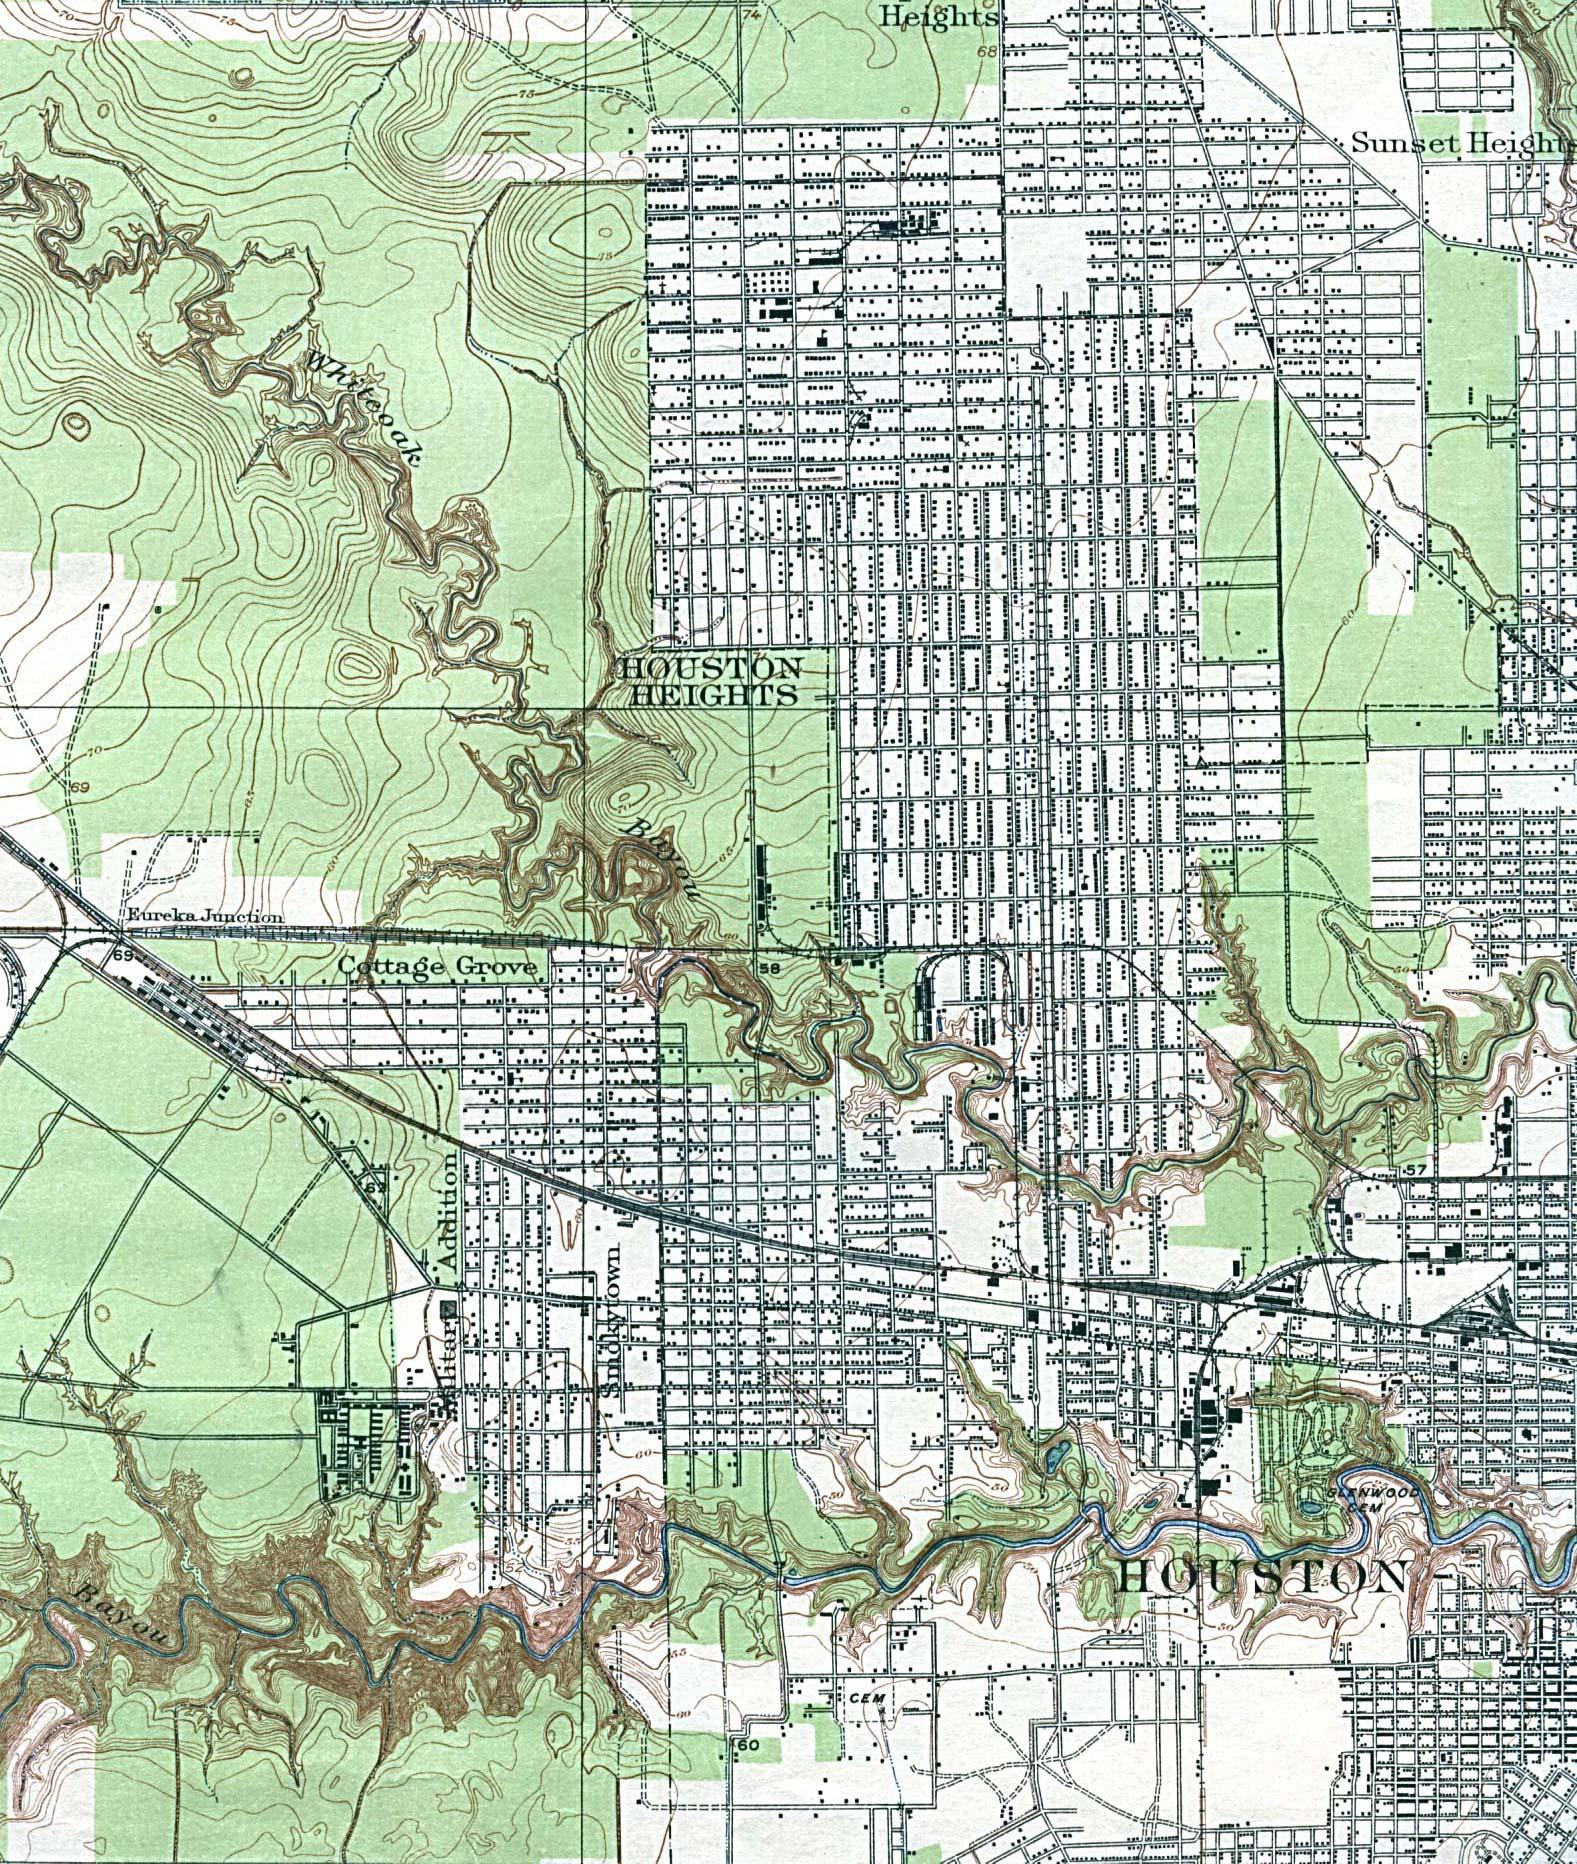 Maps of Harris County, Texas